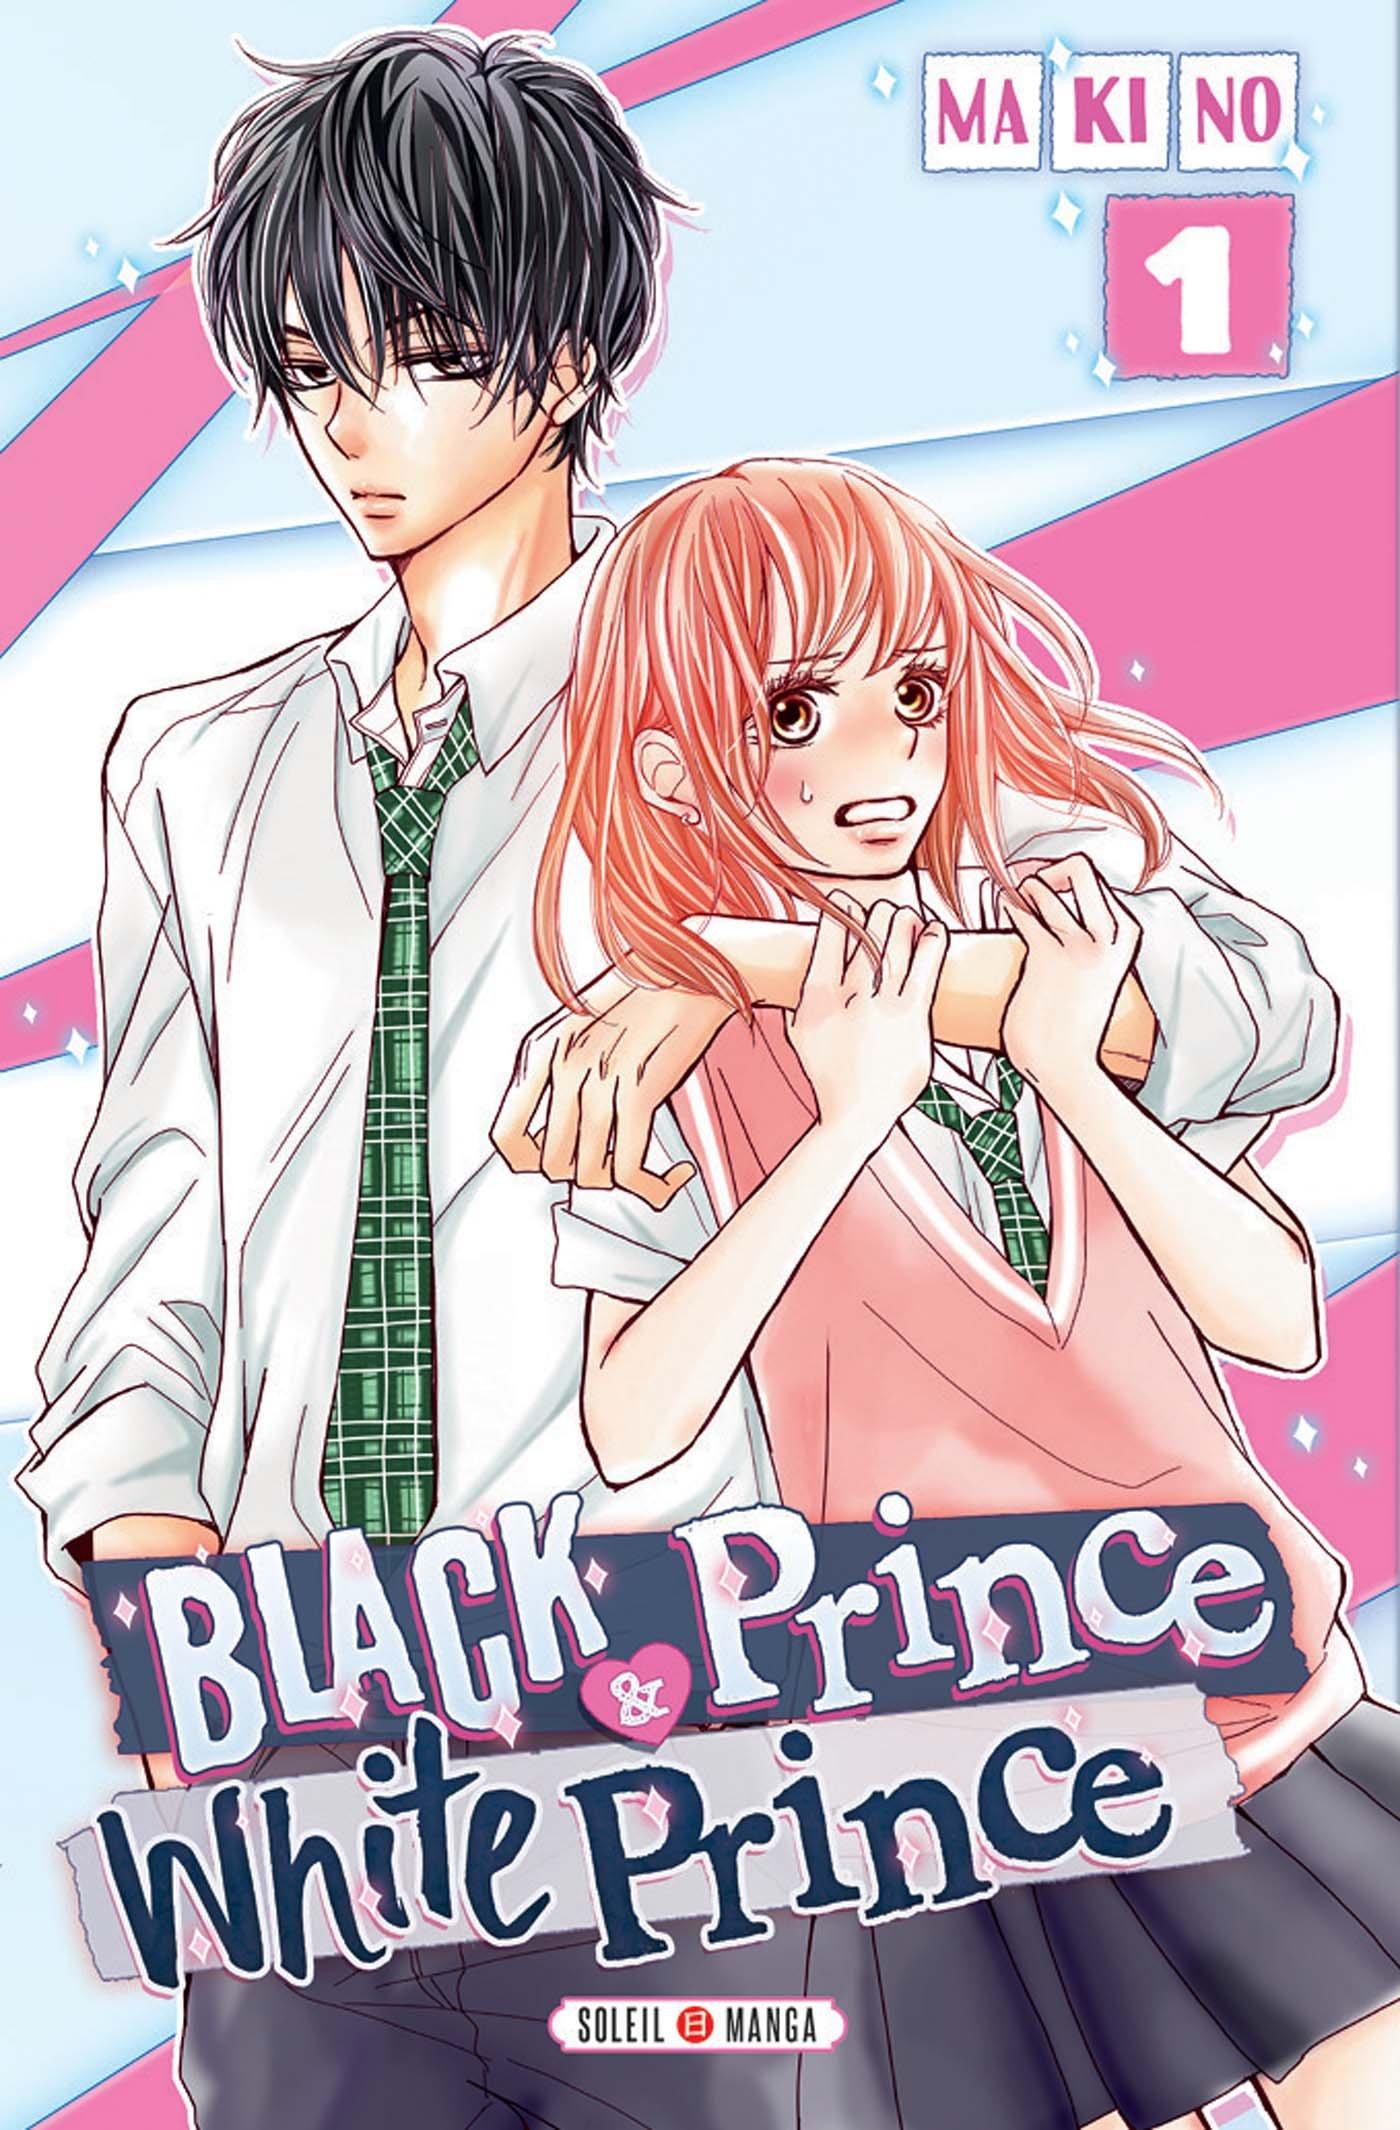 Manga black prince white prince